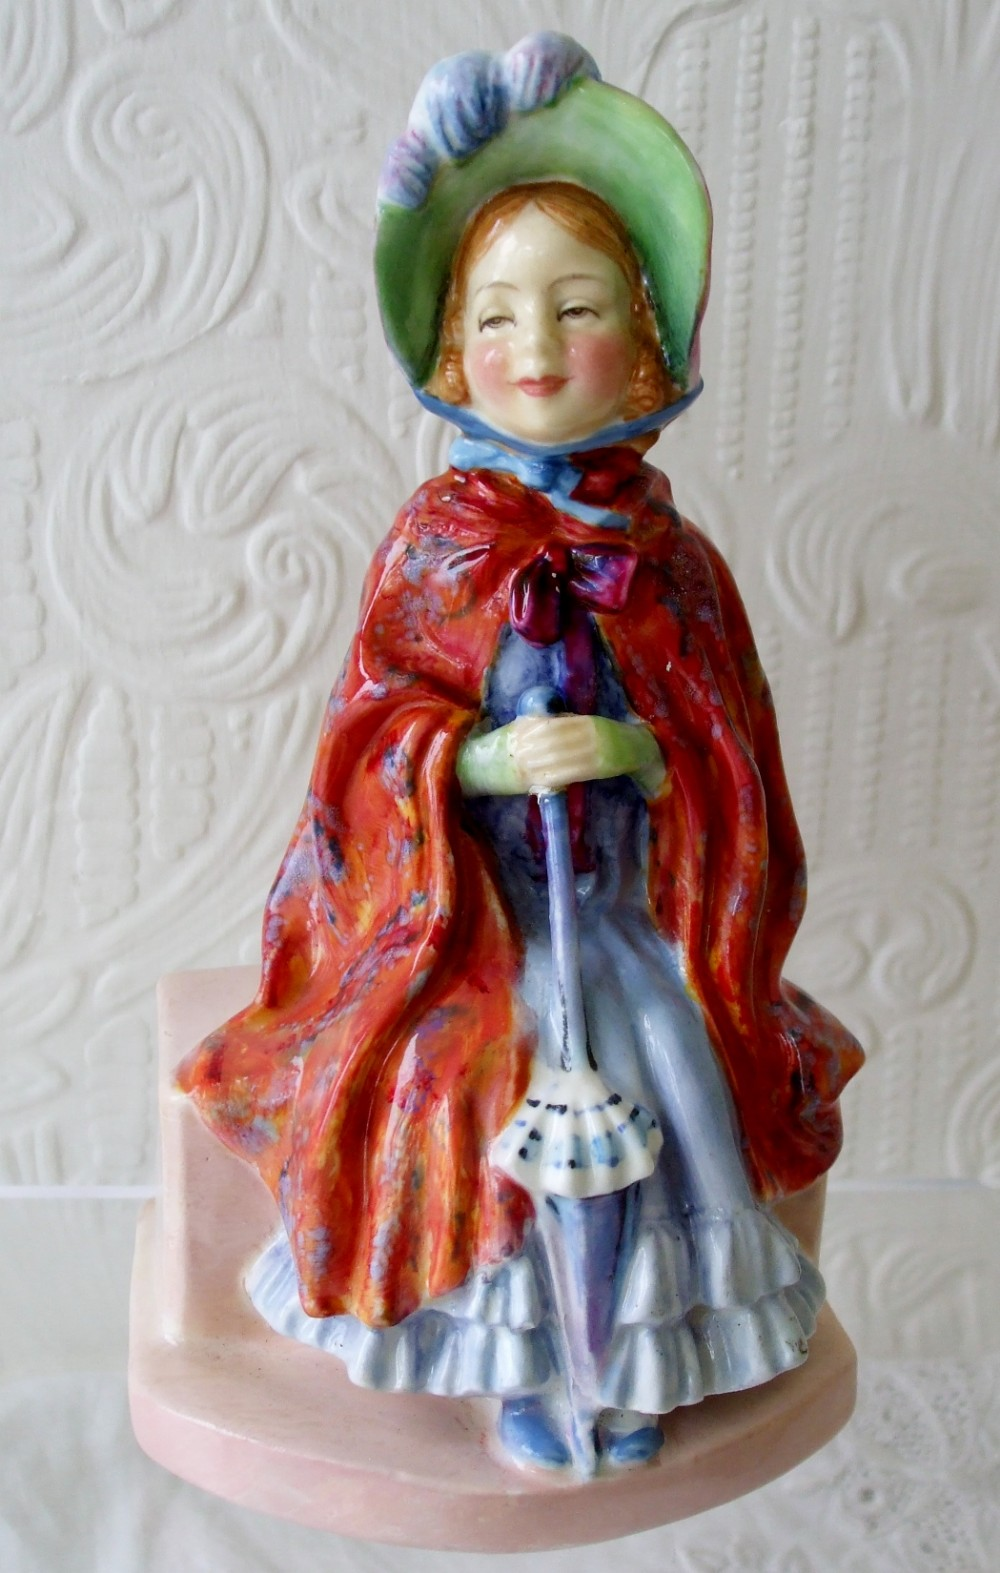 vintage royal doulton english porcelain figurine little lady make believe hn 1870